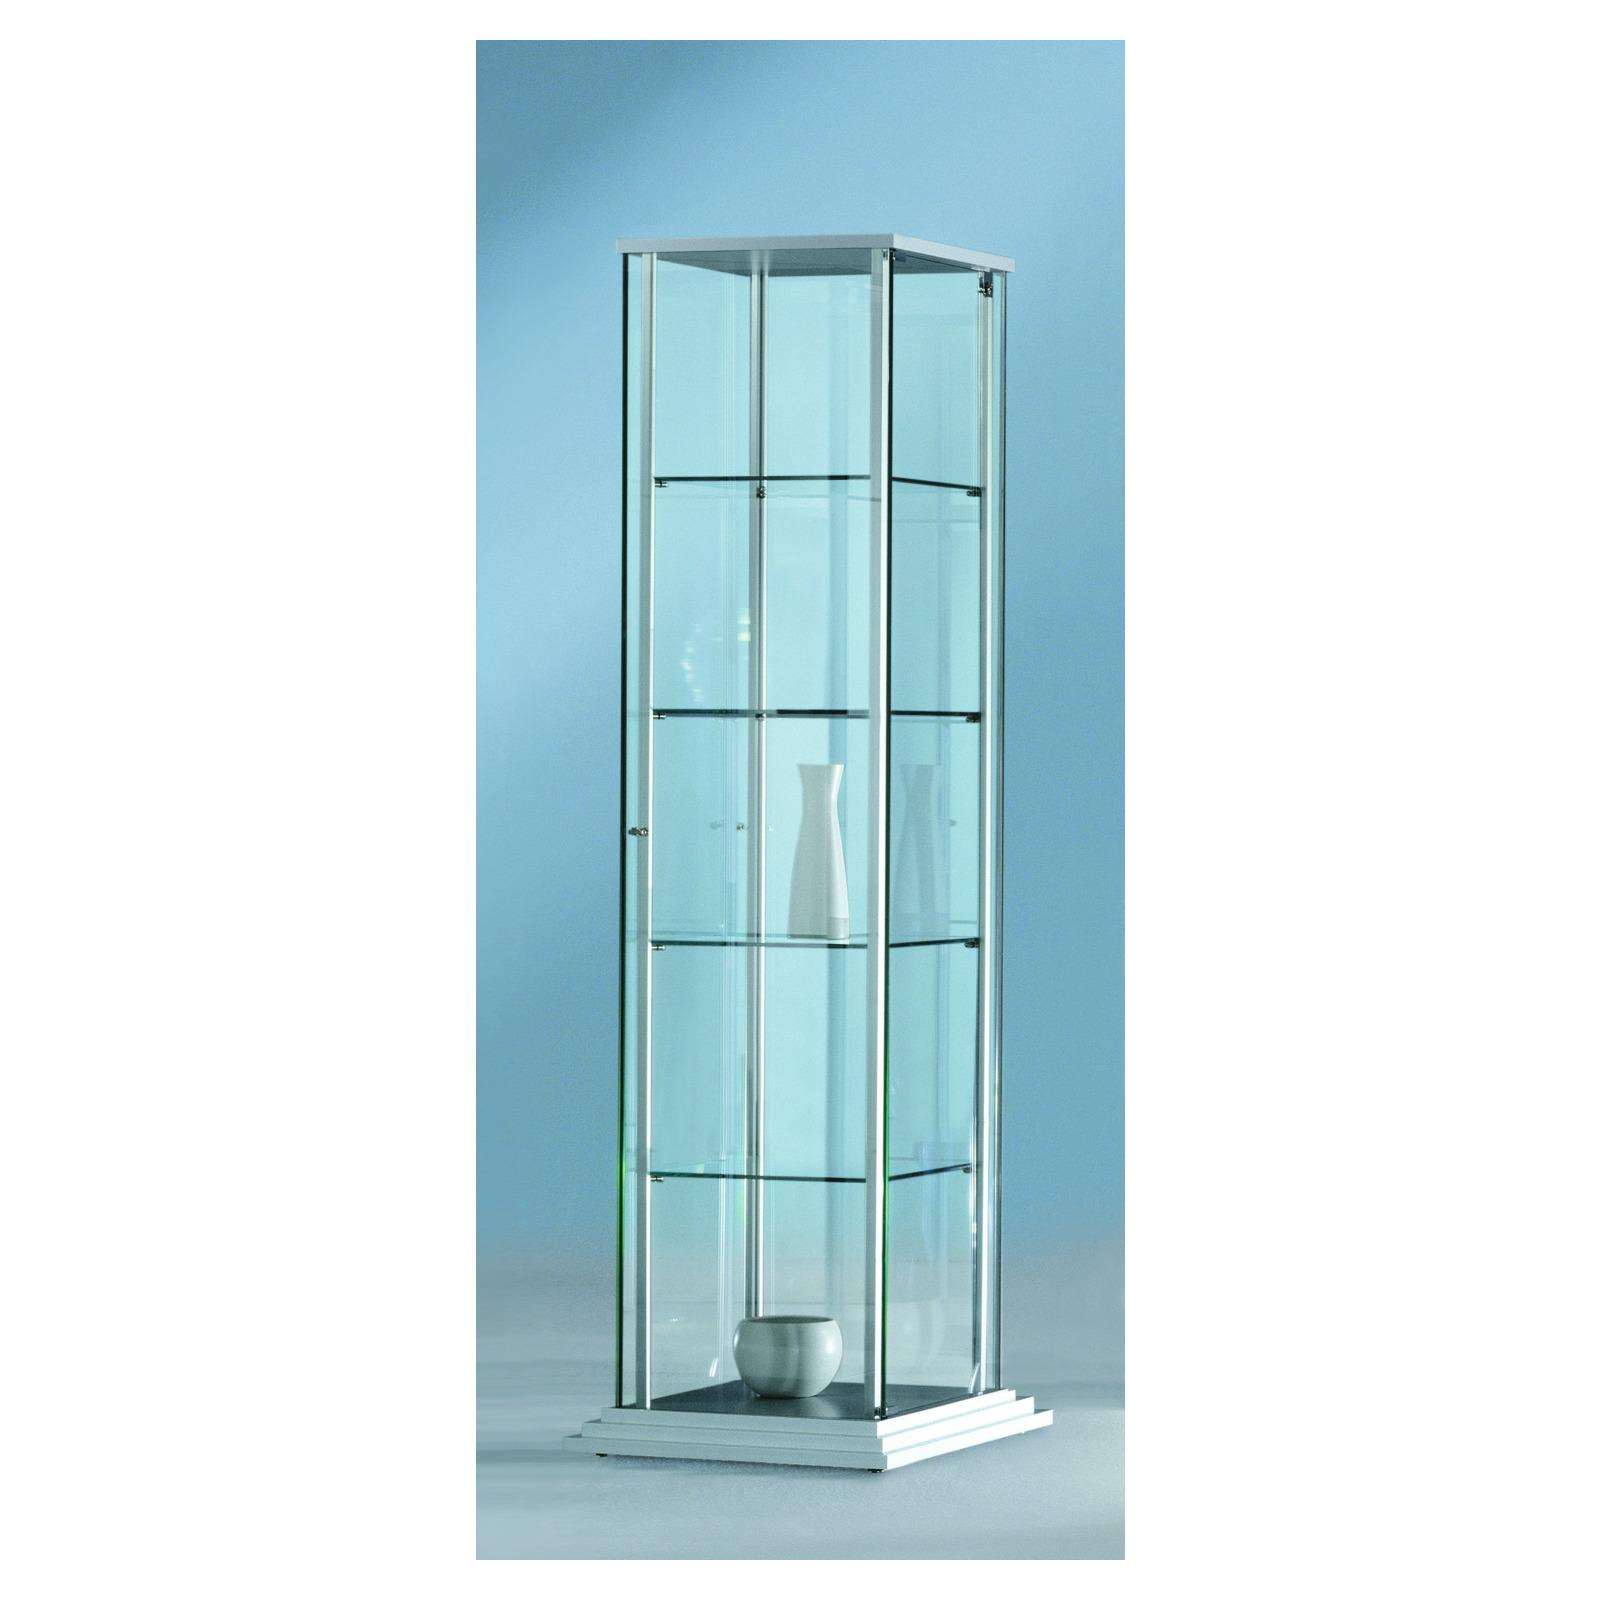 glasvitrine esg glas forum 3 glasvitrine forum vitrinen ladeneinrichtung ladeneinrichtung. Black Bedroom Furniture Sets. Home Design Ideas